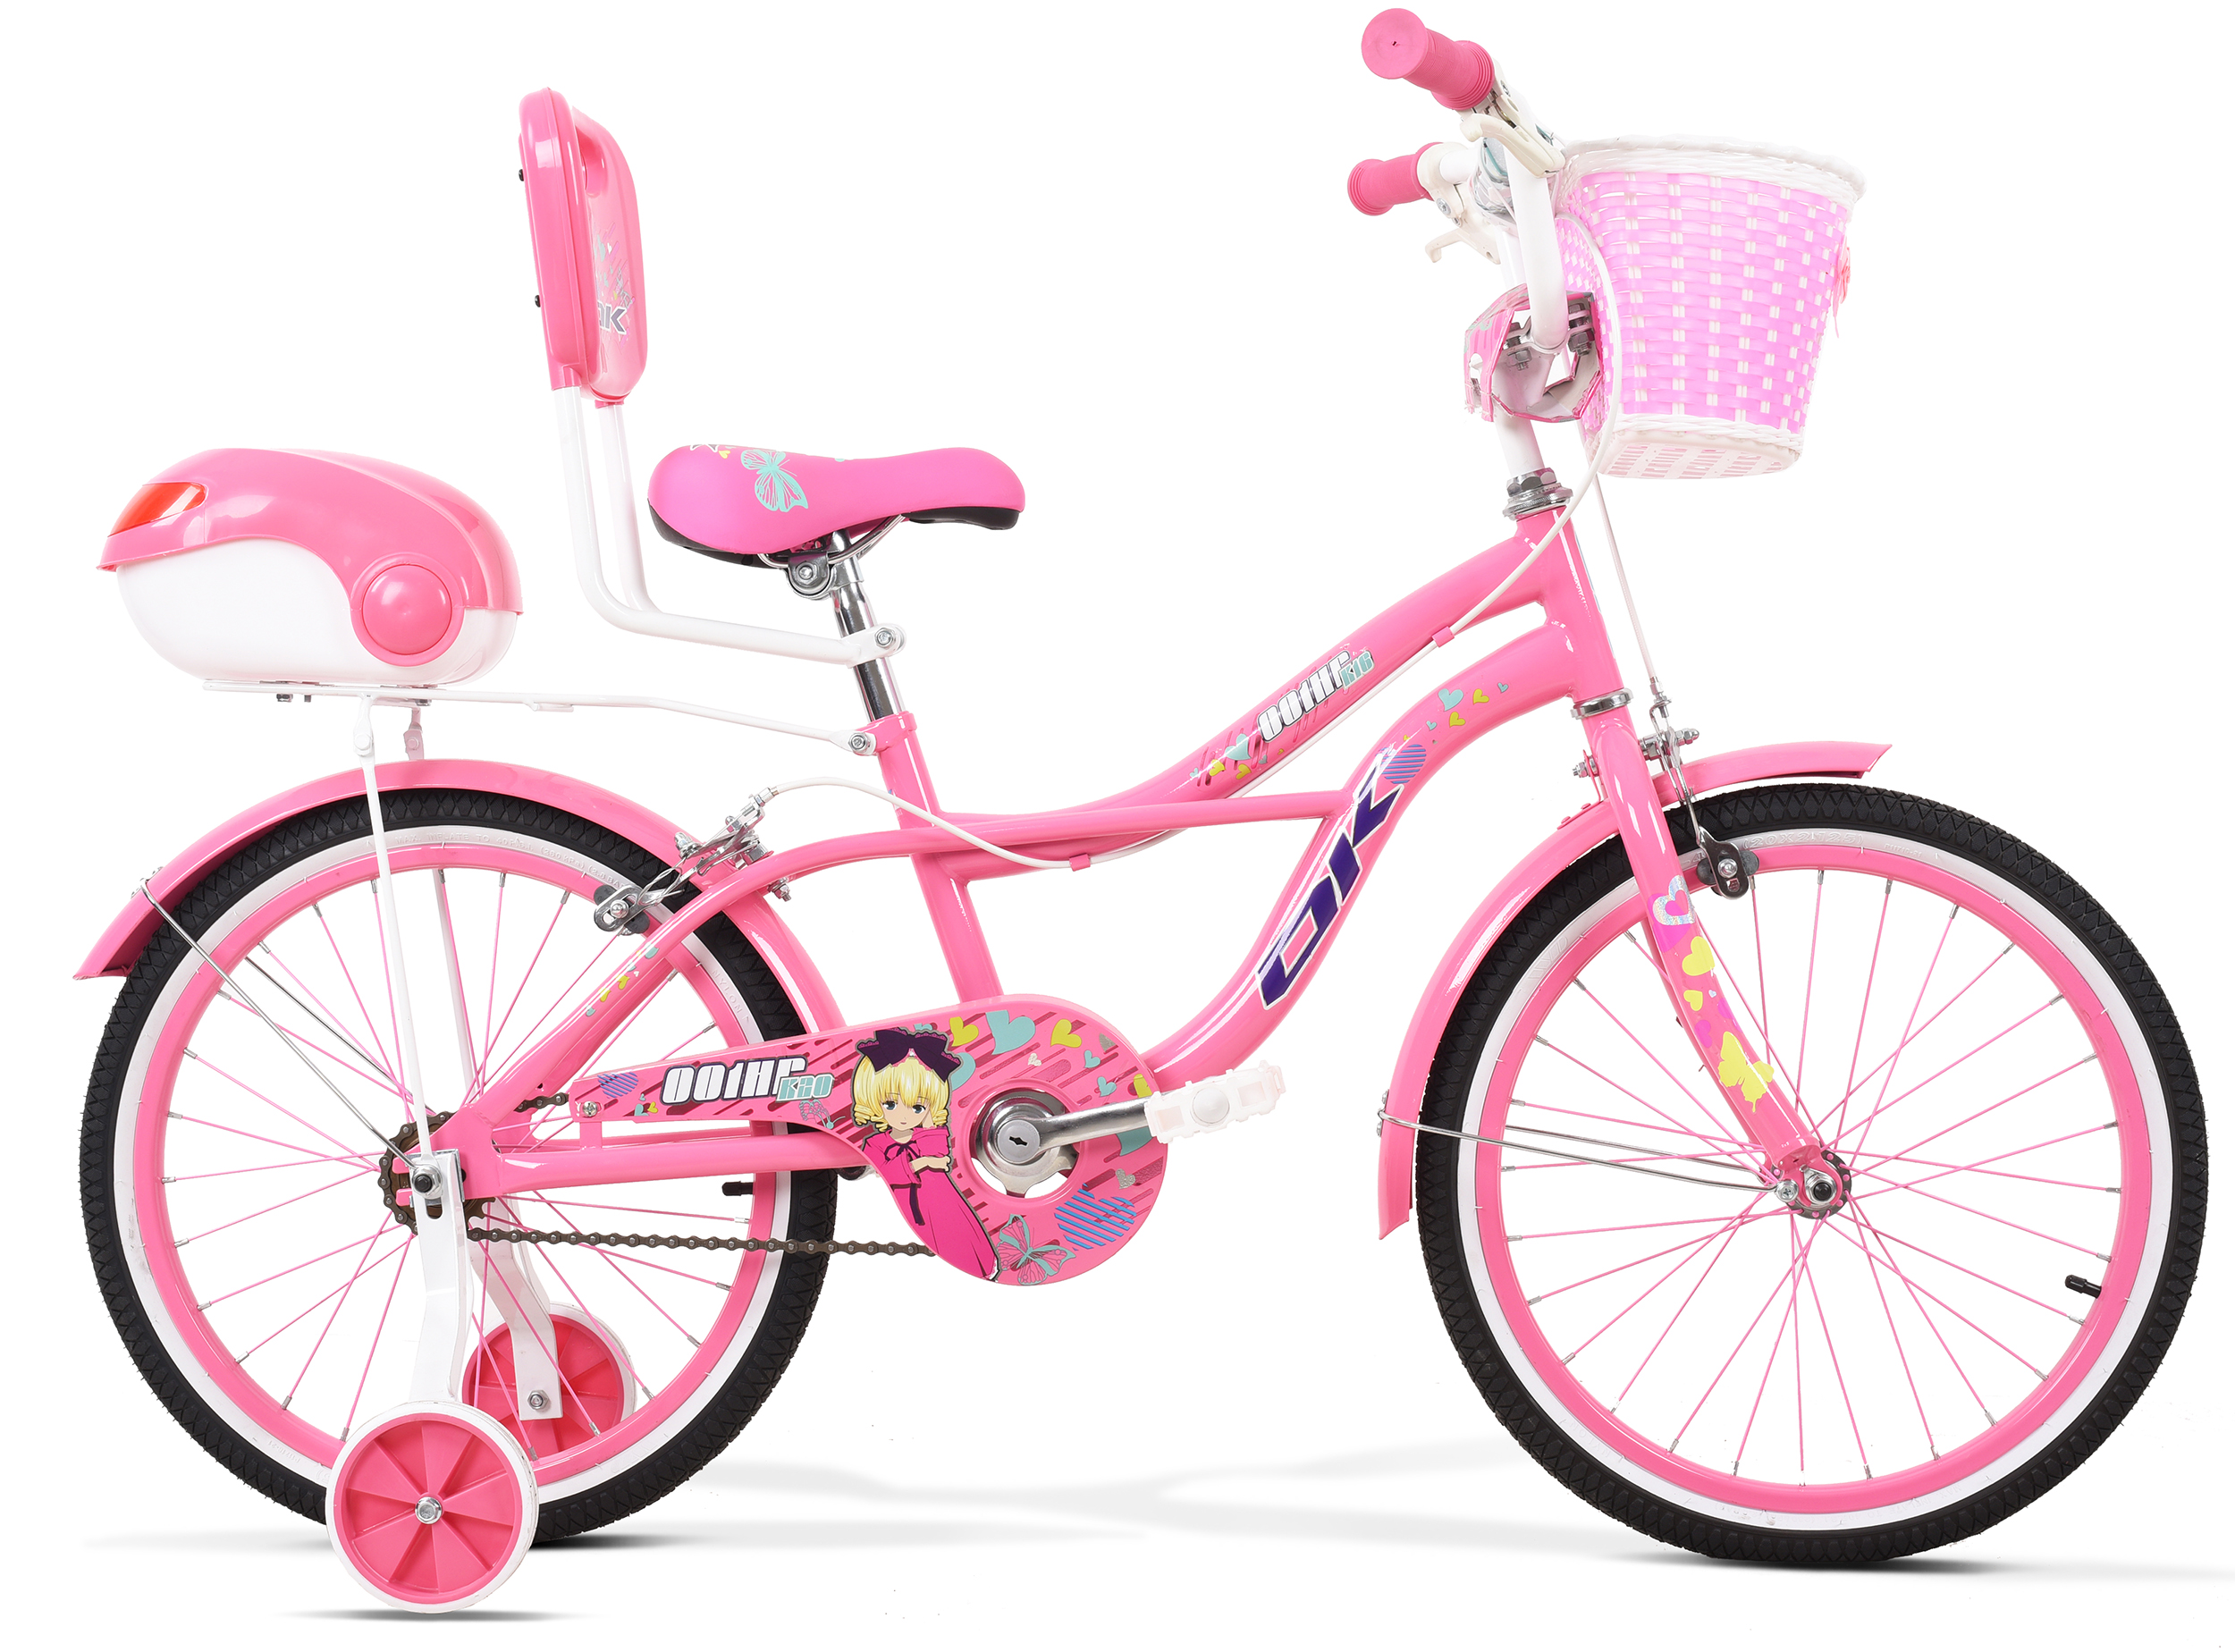 دوچرخه سایز 20 مدل K20001HR